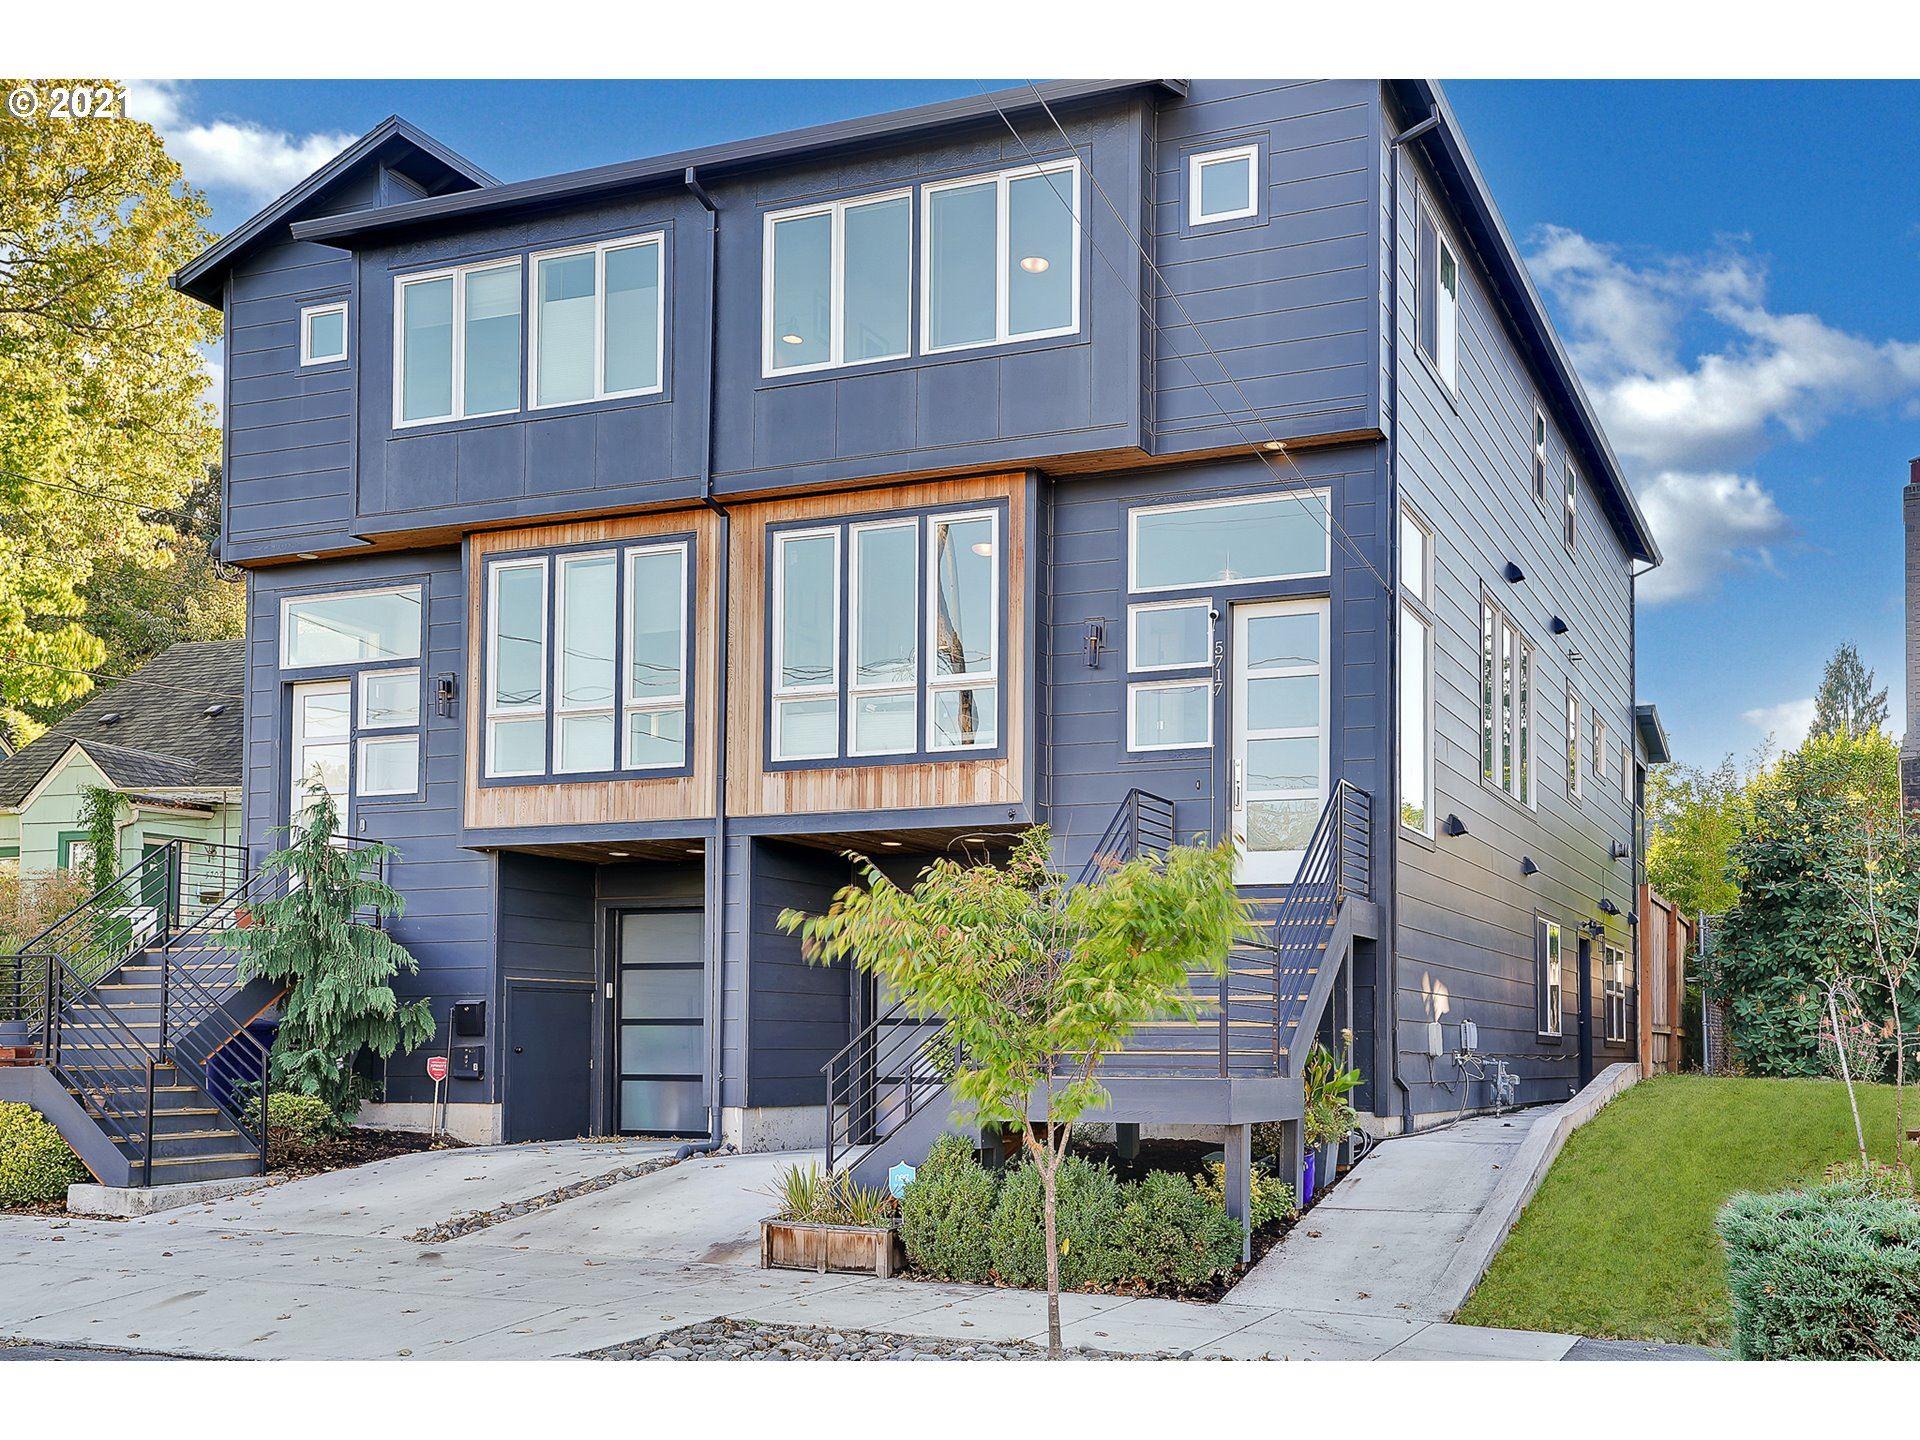 5717 NE 12TH AVE, Portland, OR 97211 - MLS#: 21161517